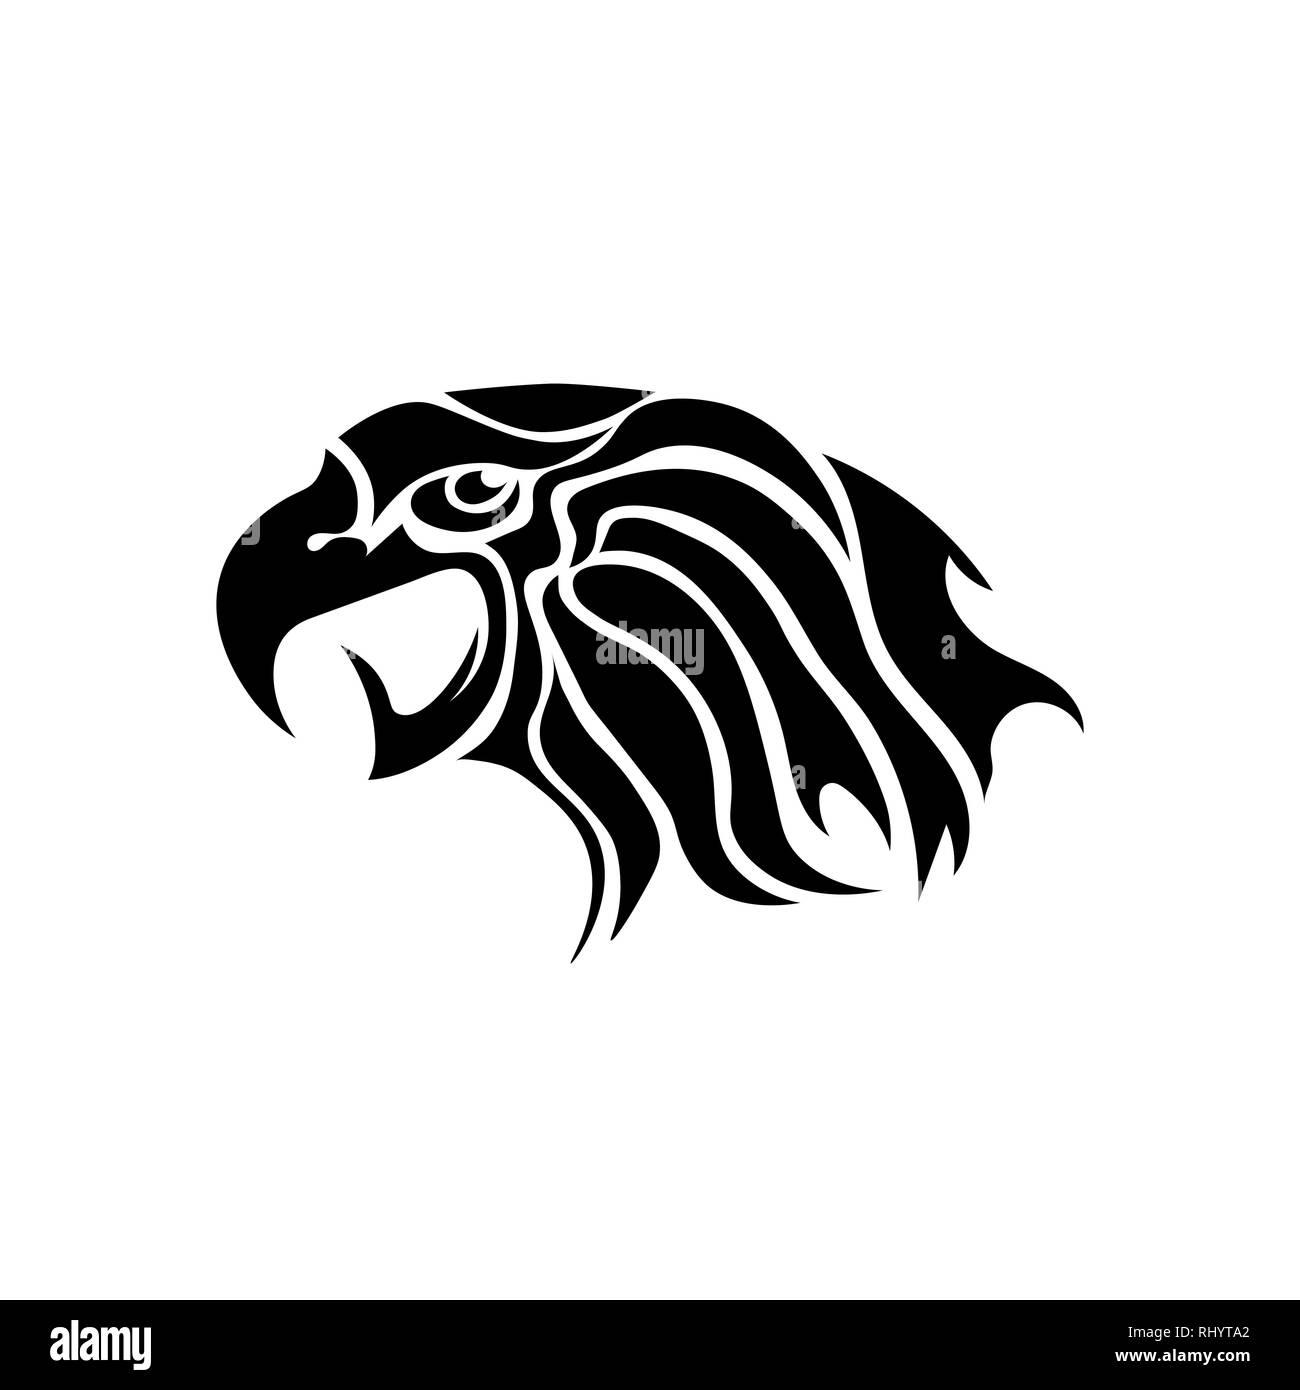 Eagle Head Tattoo Design Logo Prey Bird Stock Vector Image Art Alamy